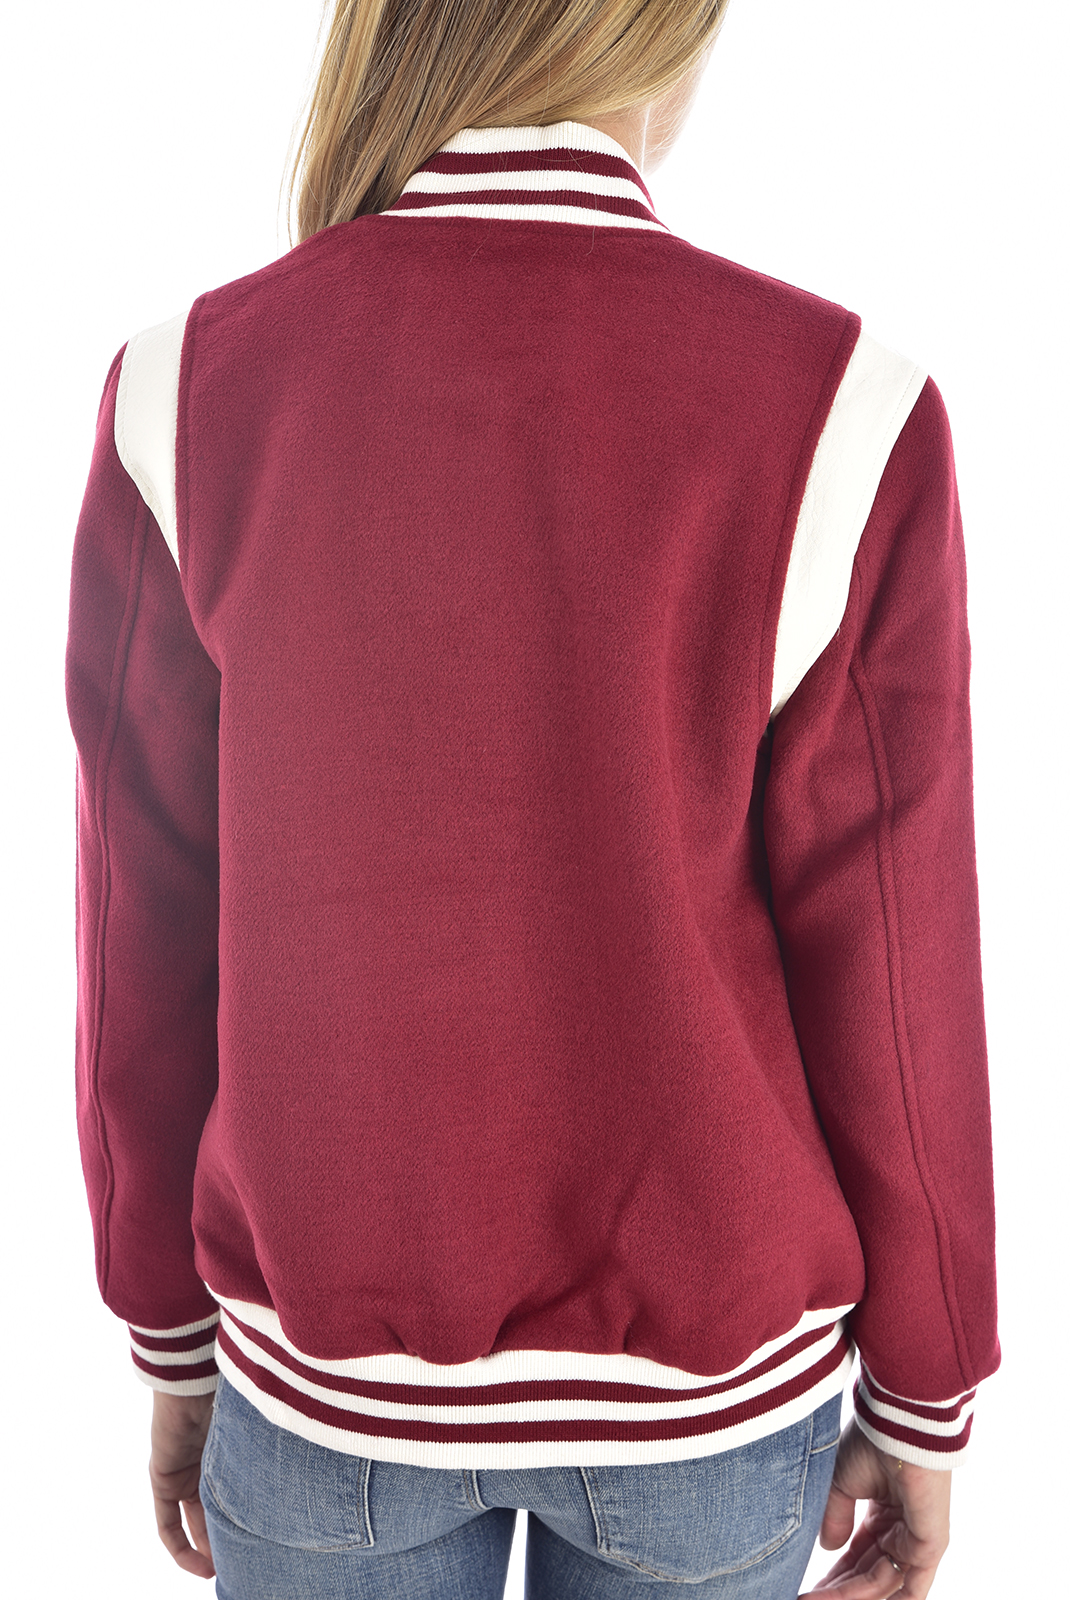 Vestes & blousons  Guess jeans W94L88 WC2S0 ROUGE/RUSSIAN RED